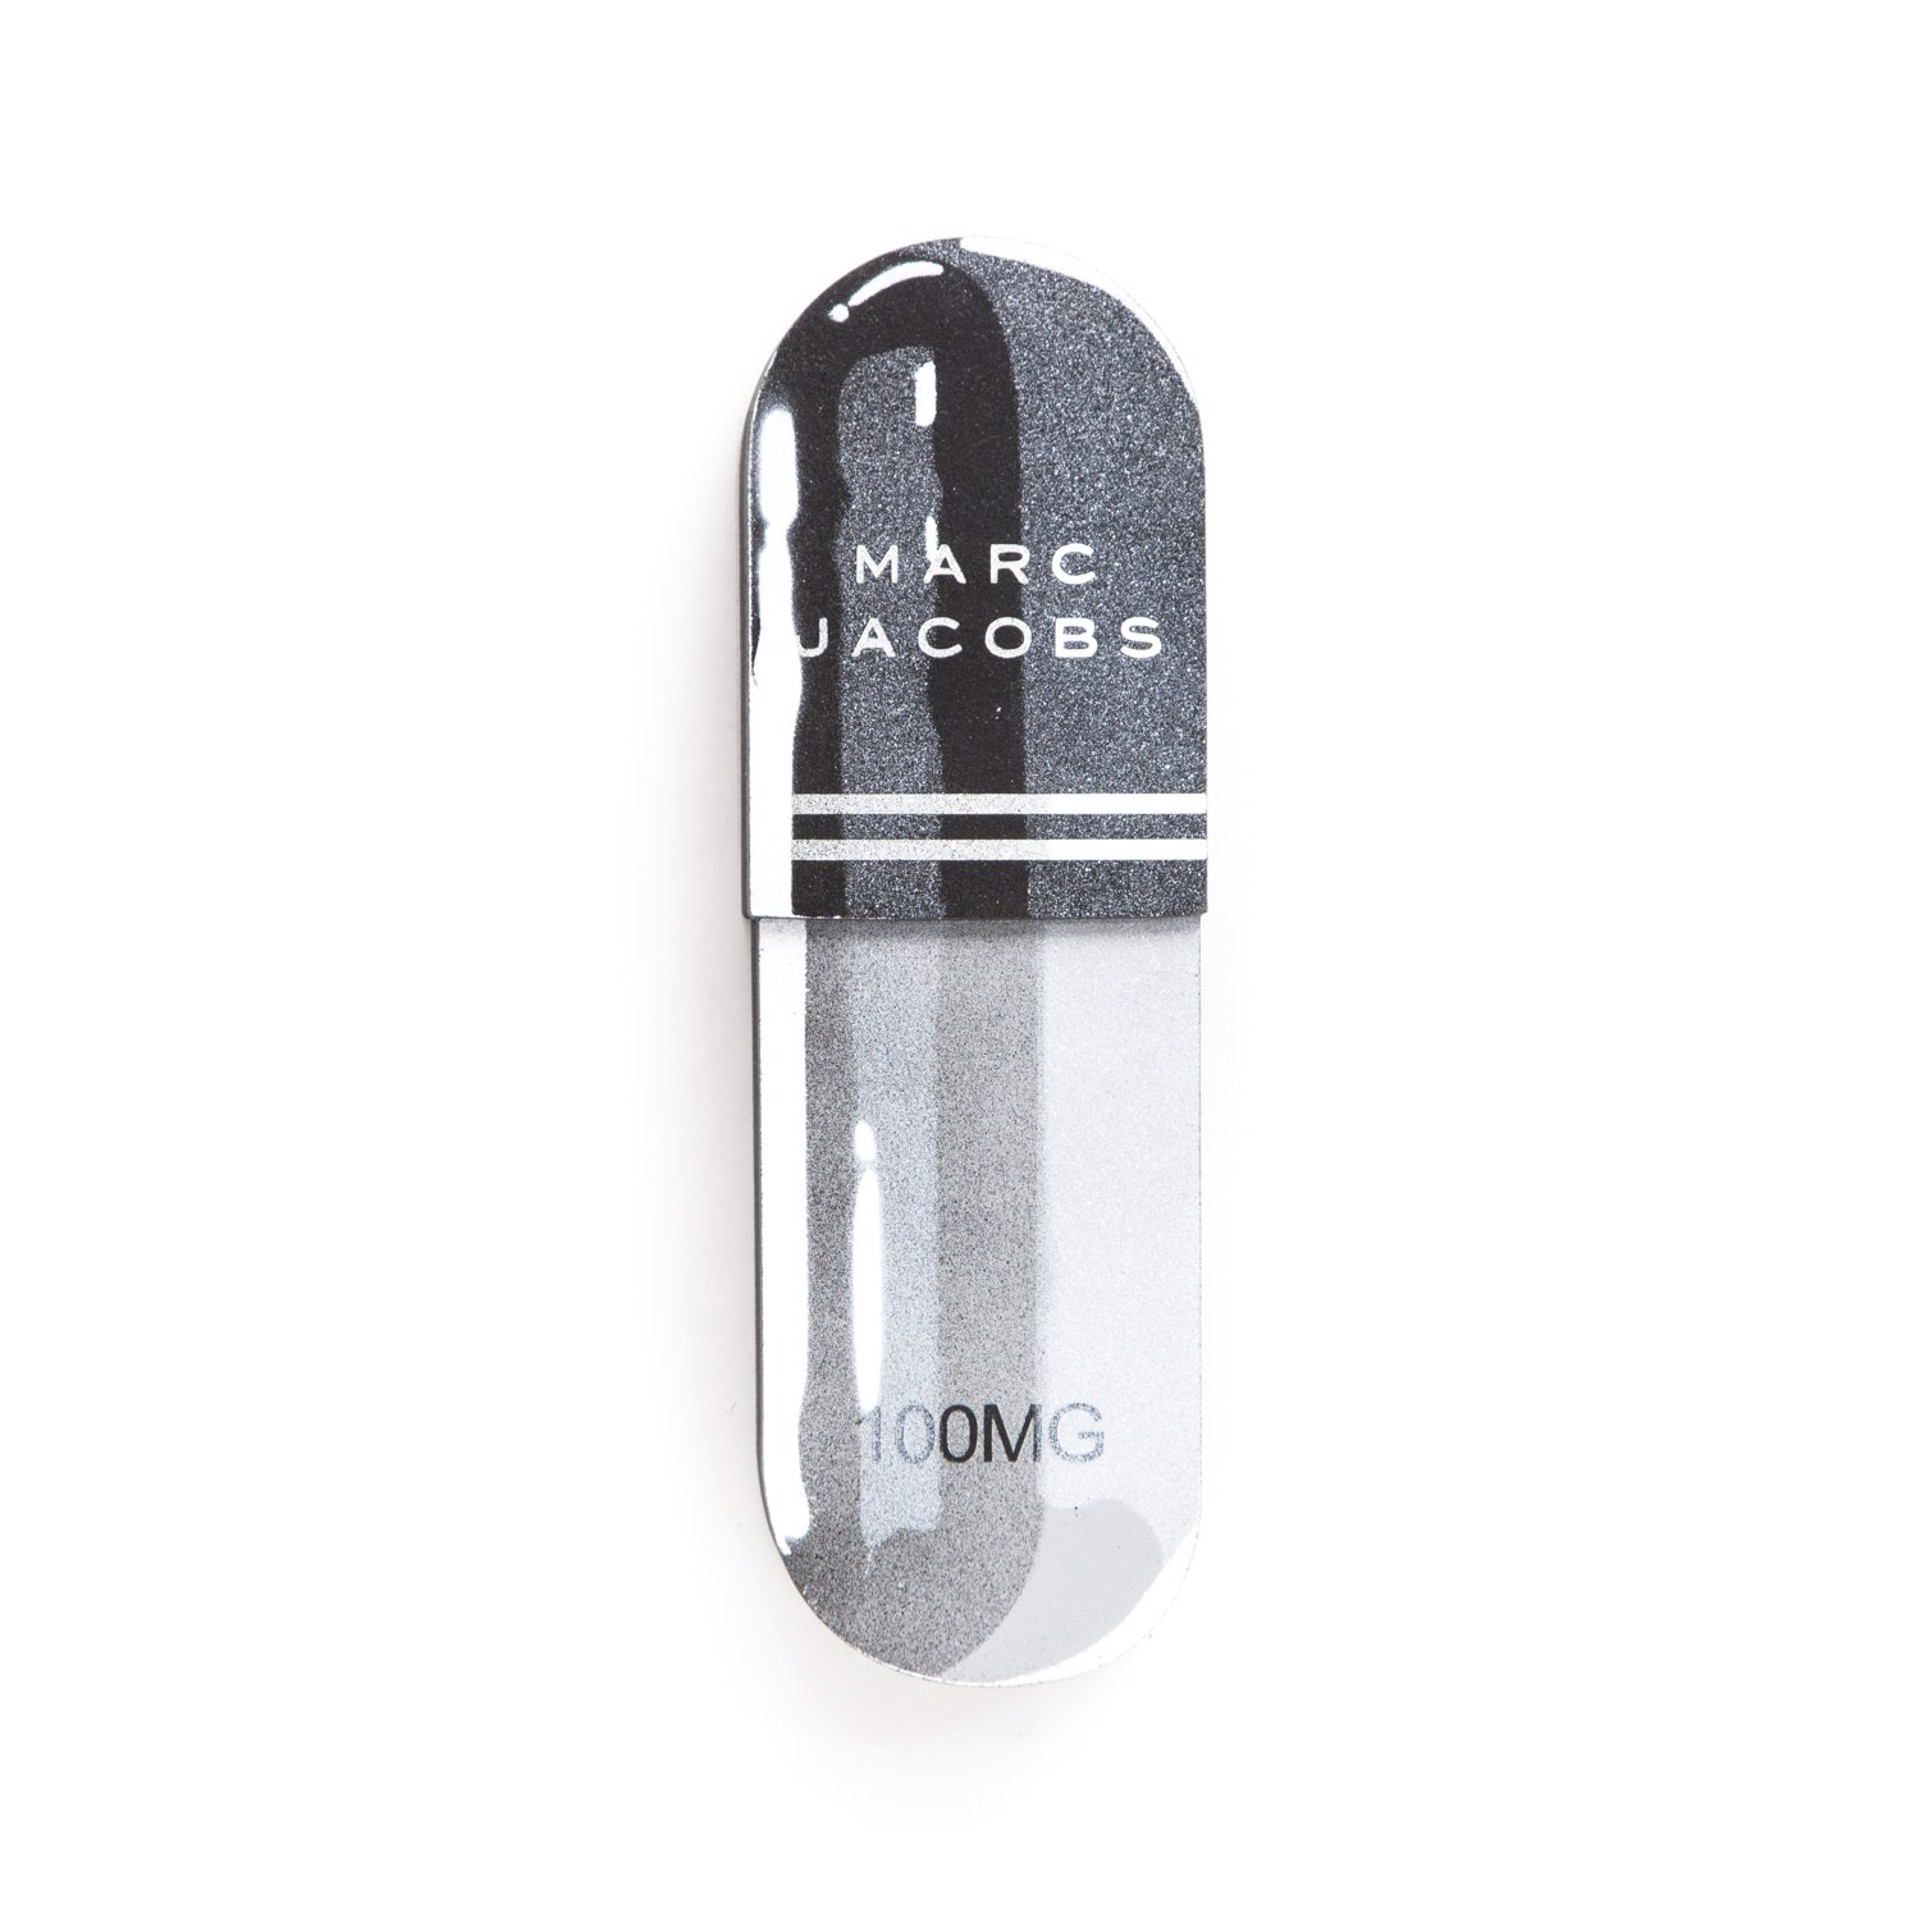 Original Micro Dose - Marc Jacobs by Denial